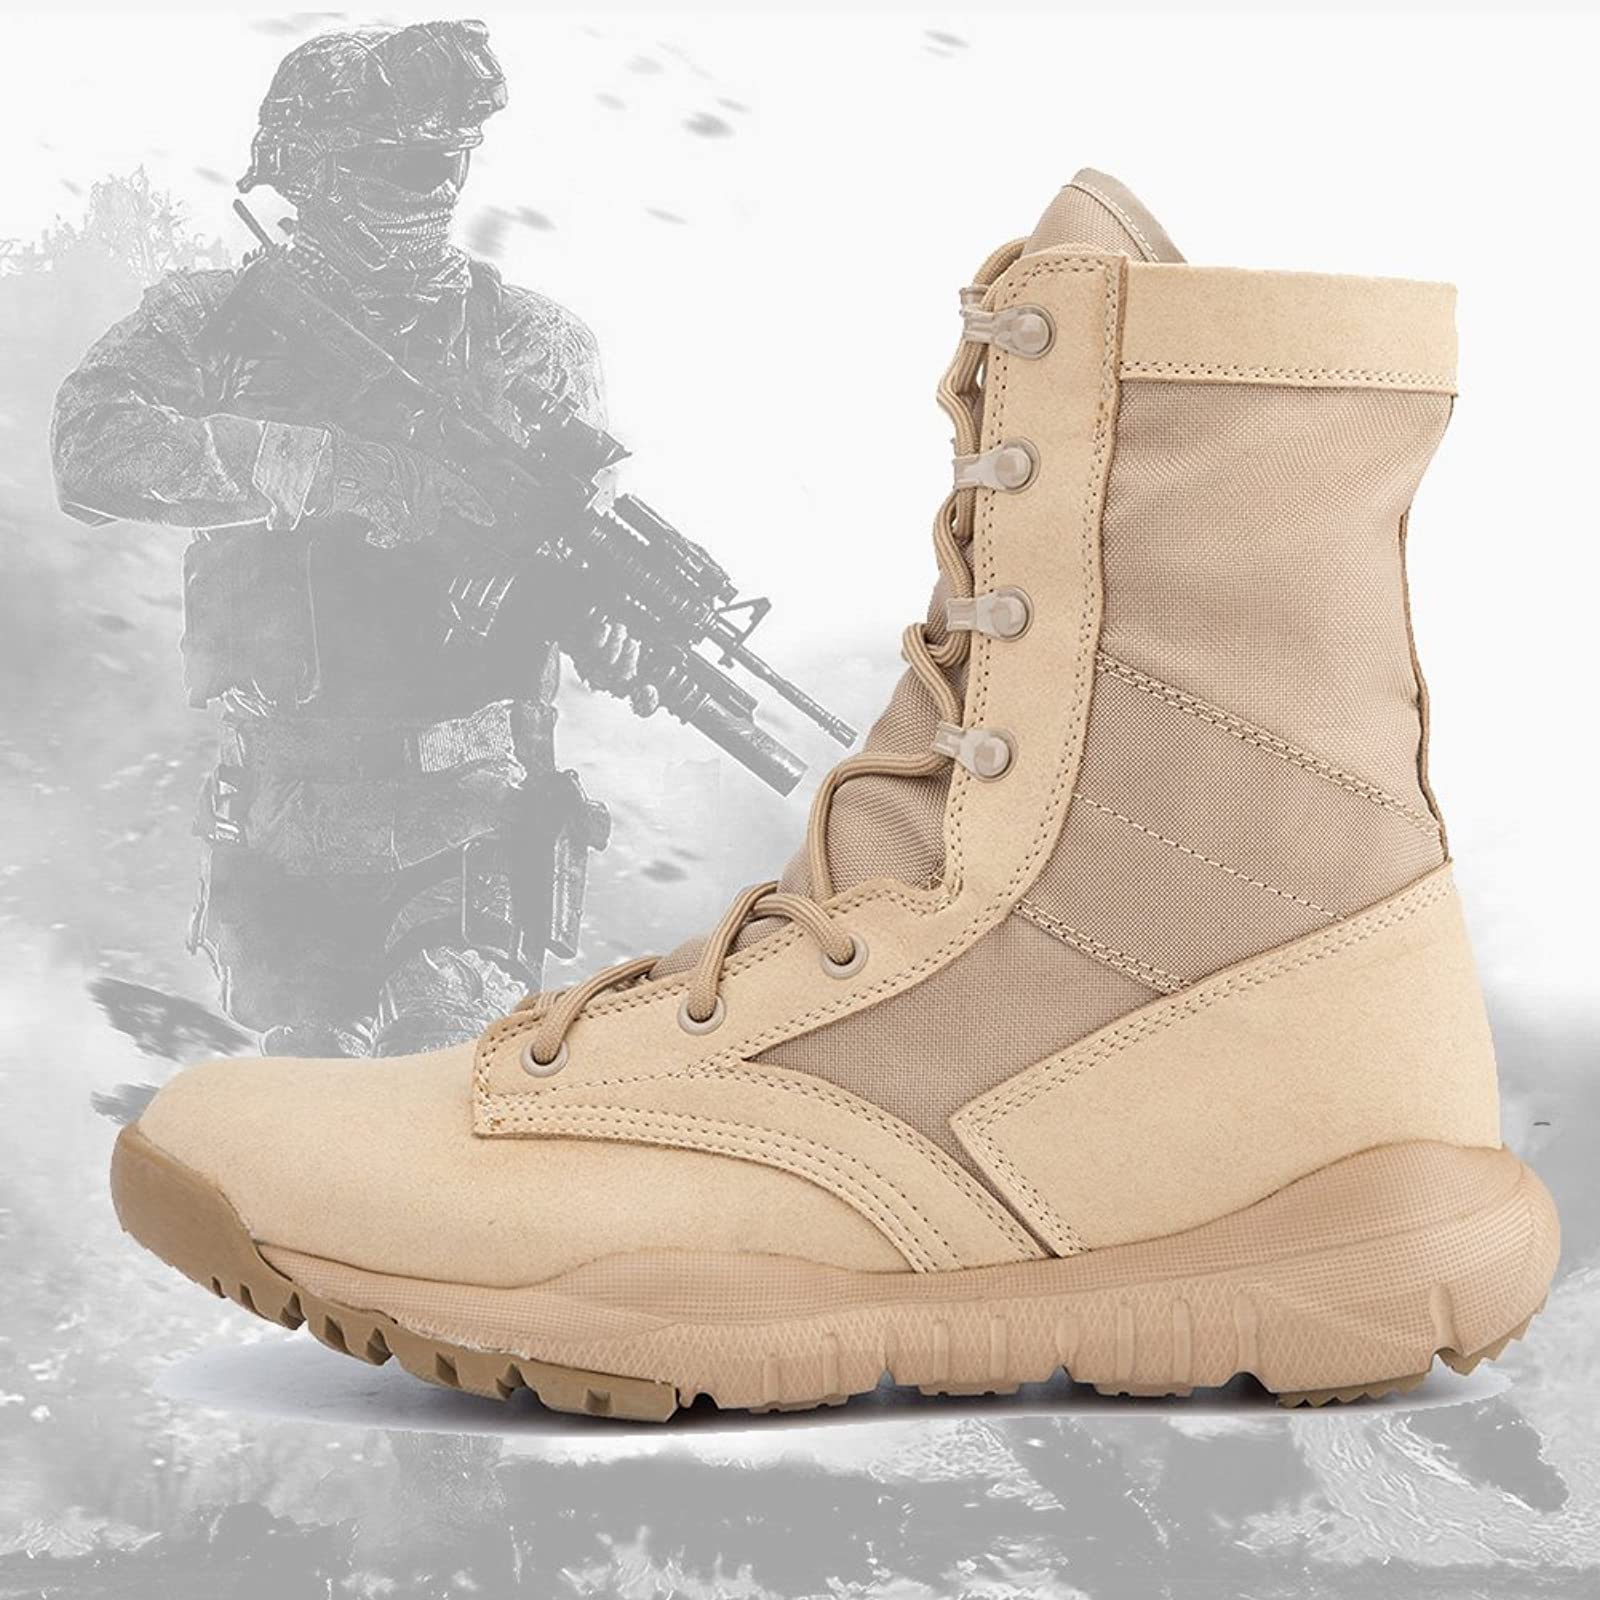 IODSON US Mens' Ultra-Light Combat Boots Beige 9.5 M US - 6